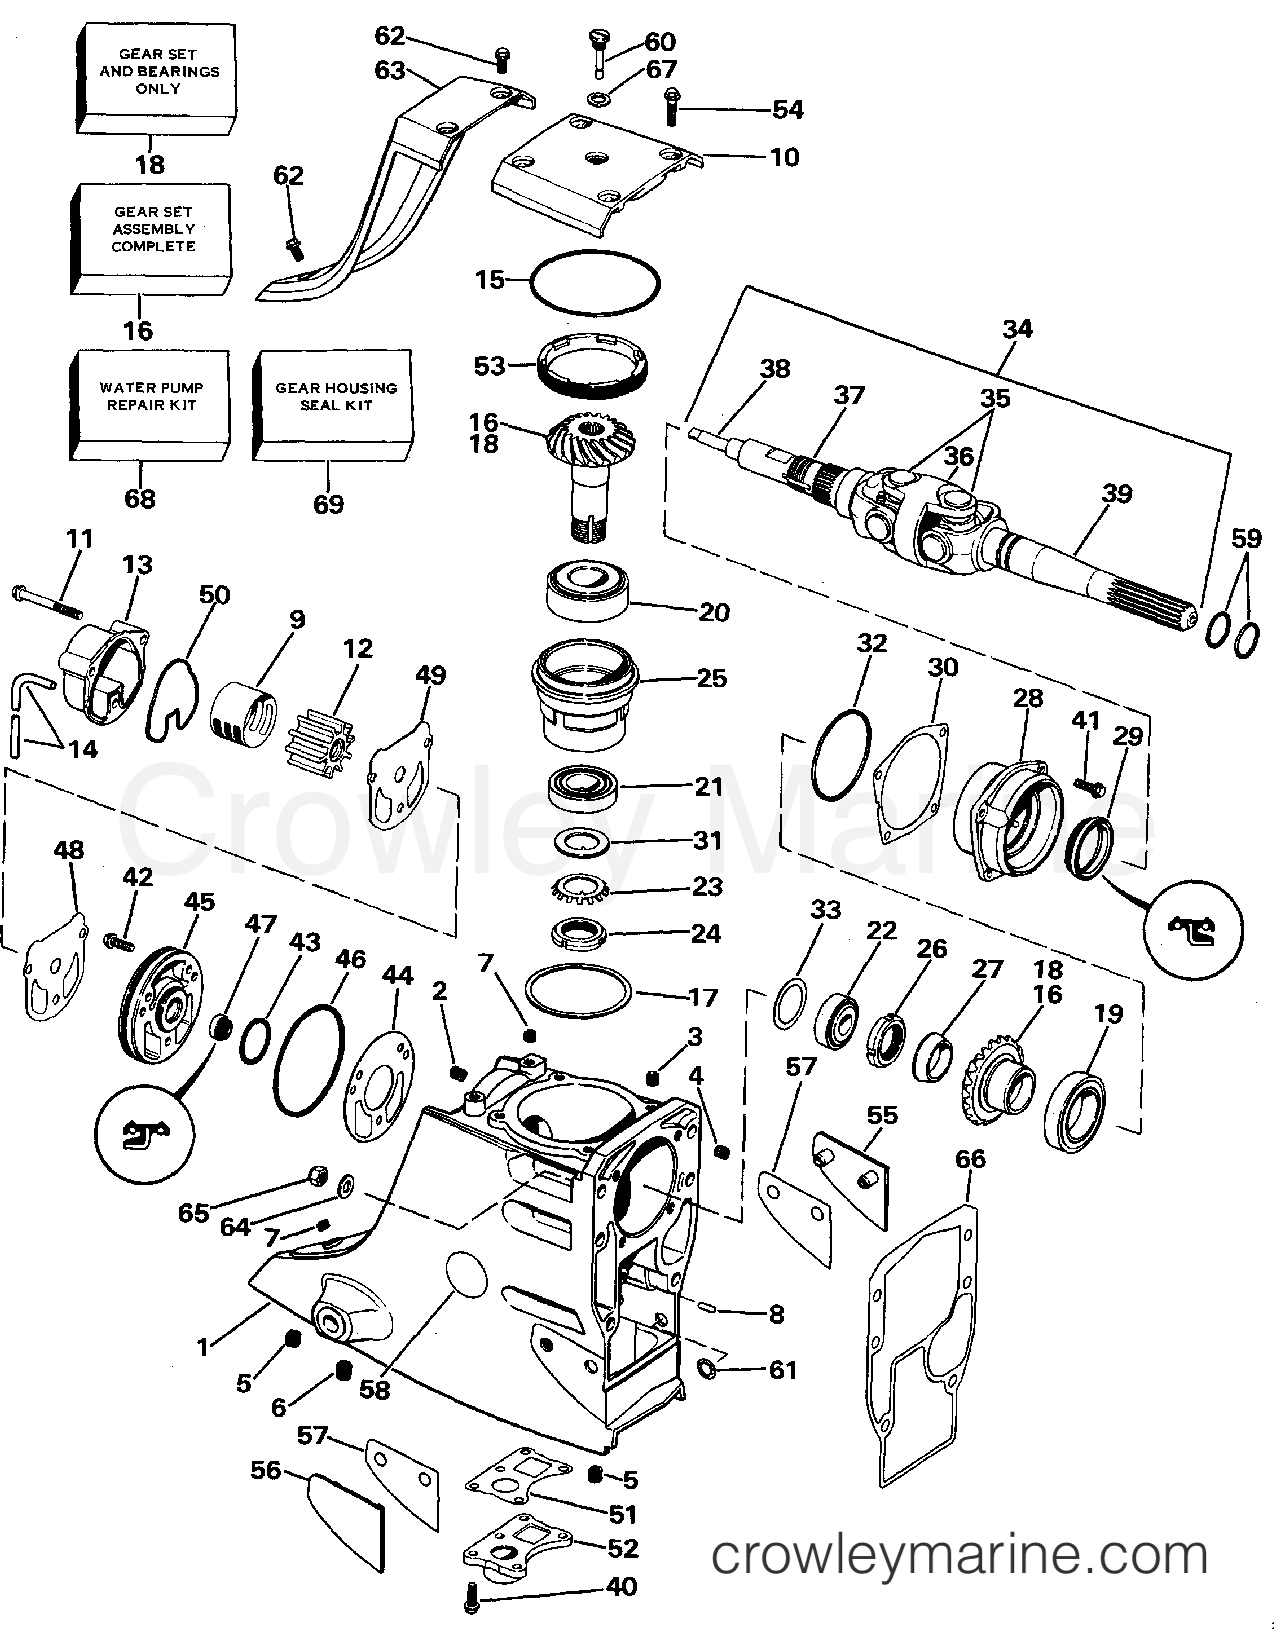 1988 OMC Stern Drive 2.3 - 232AMRGDE UPPER GEAR HOUSING section